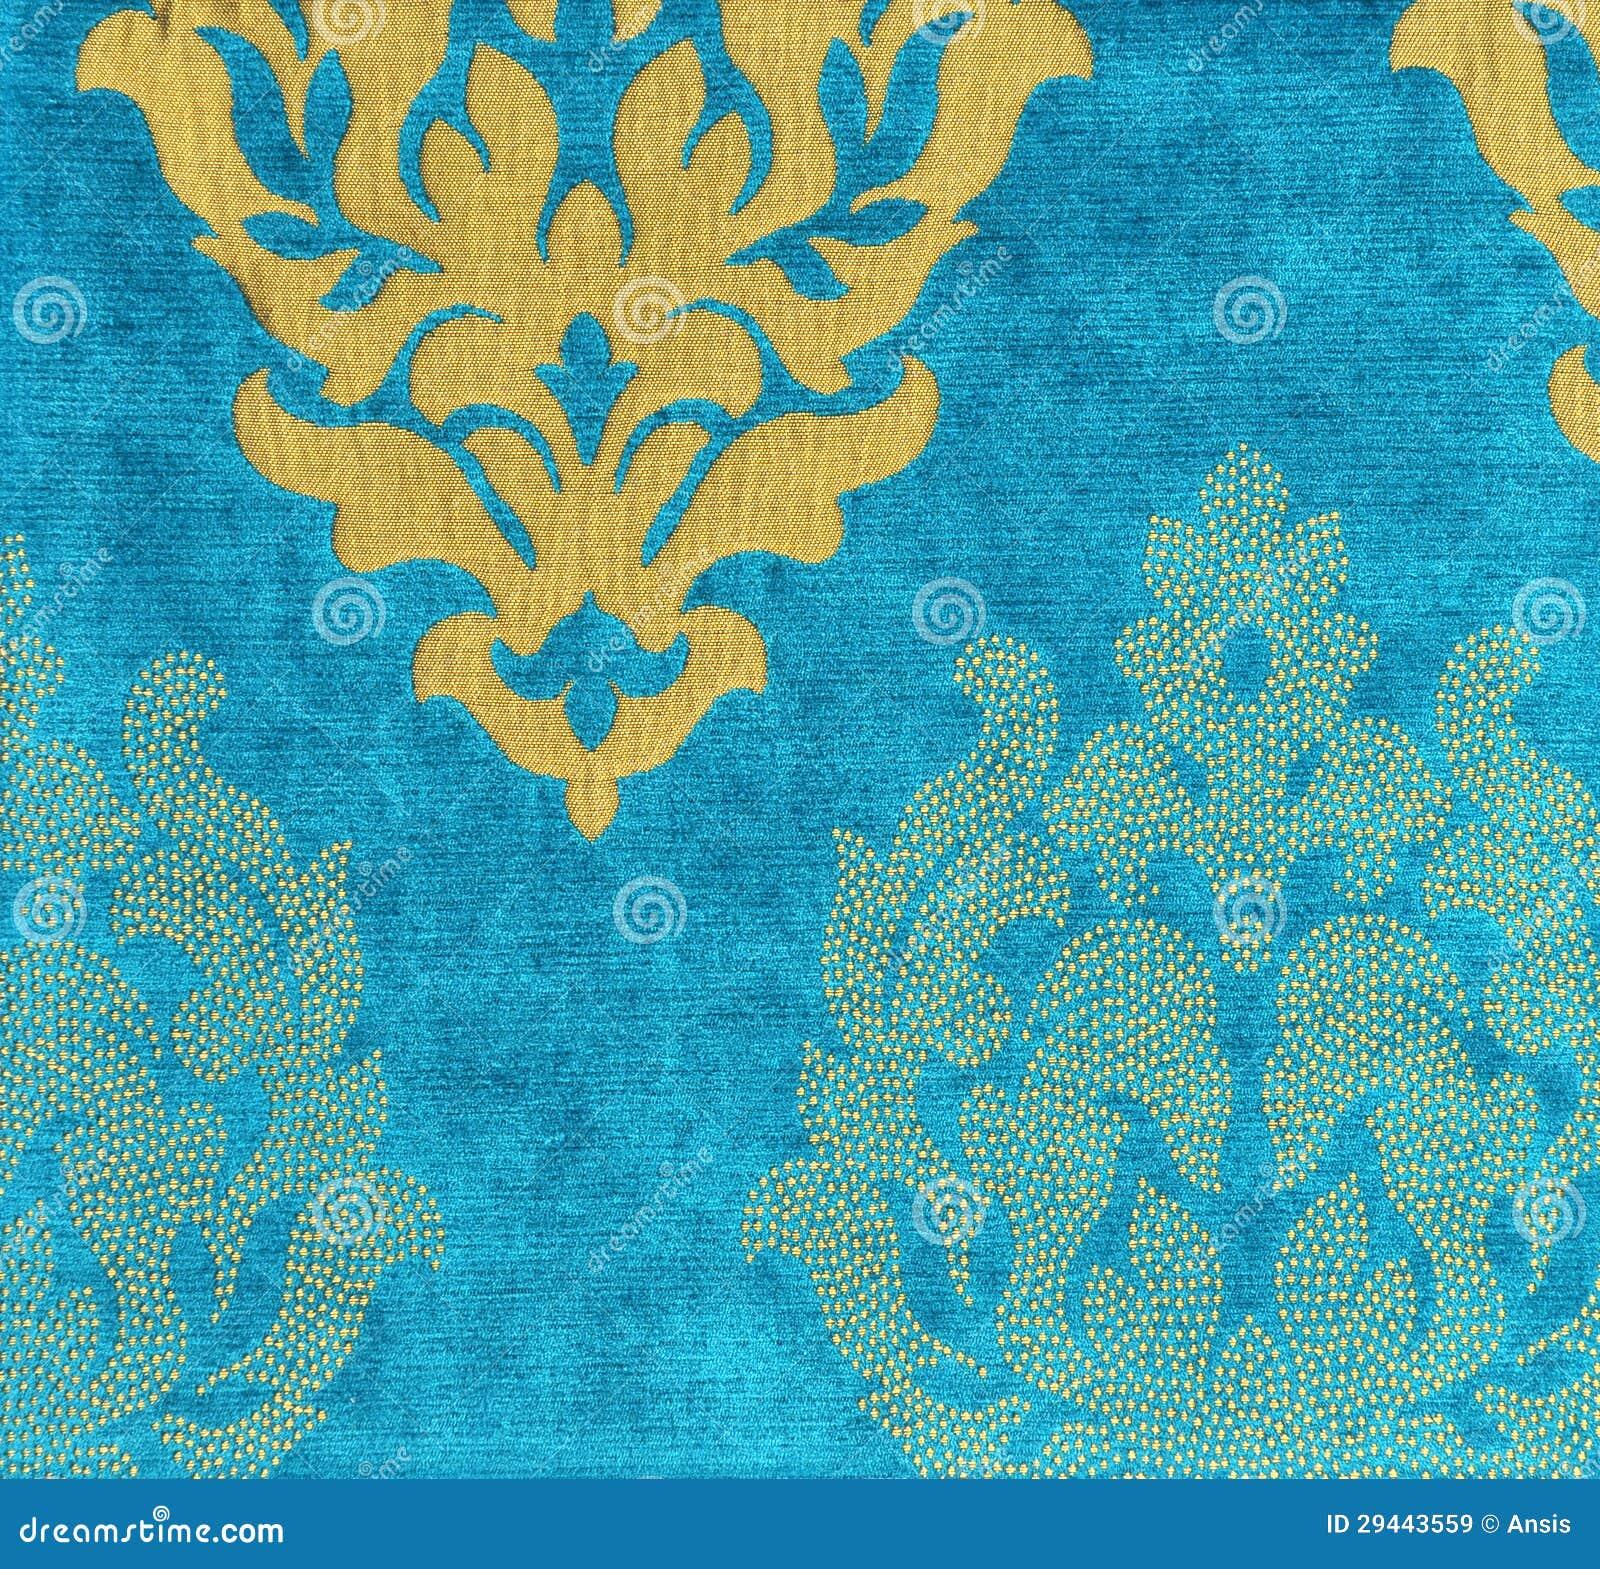 Papel De Parede Da Tela Veludo Dourado Decorativo Royalty Free